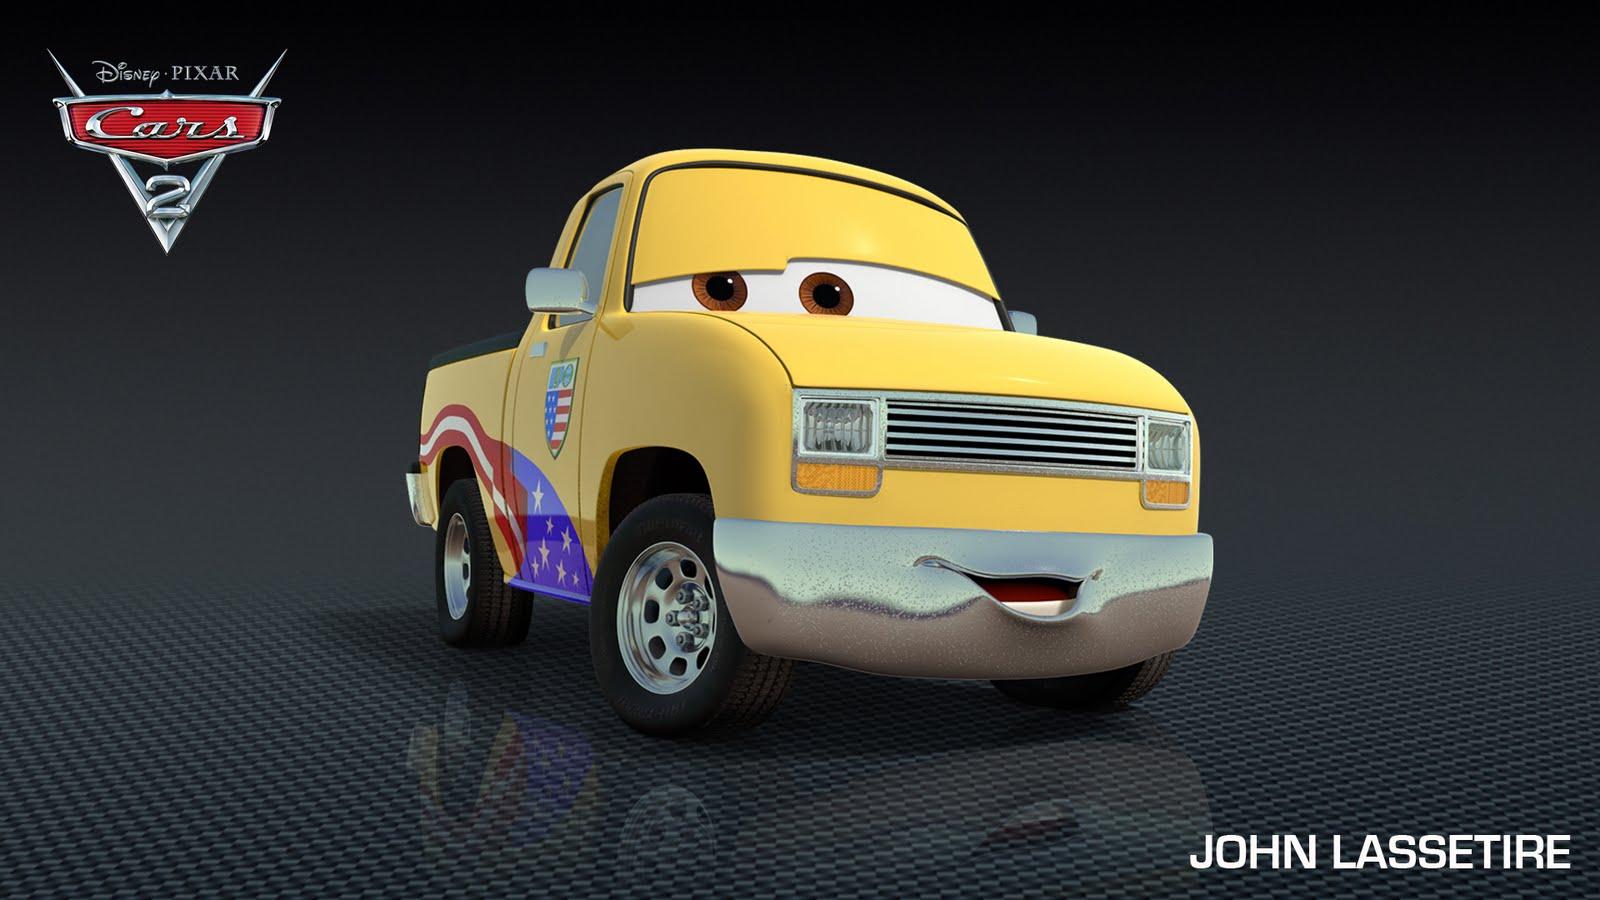 John Lasseter to Cameo in Cars 2